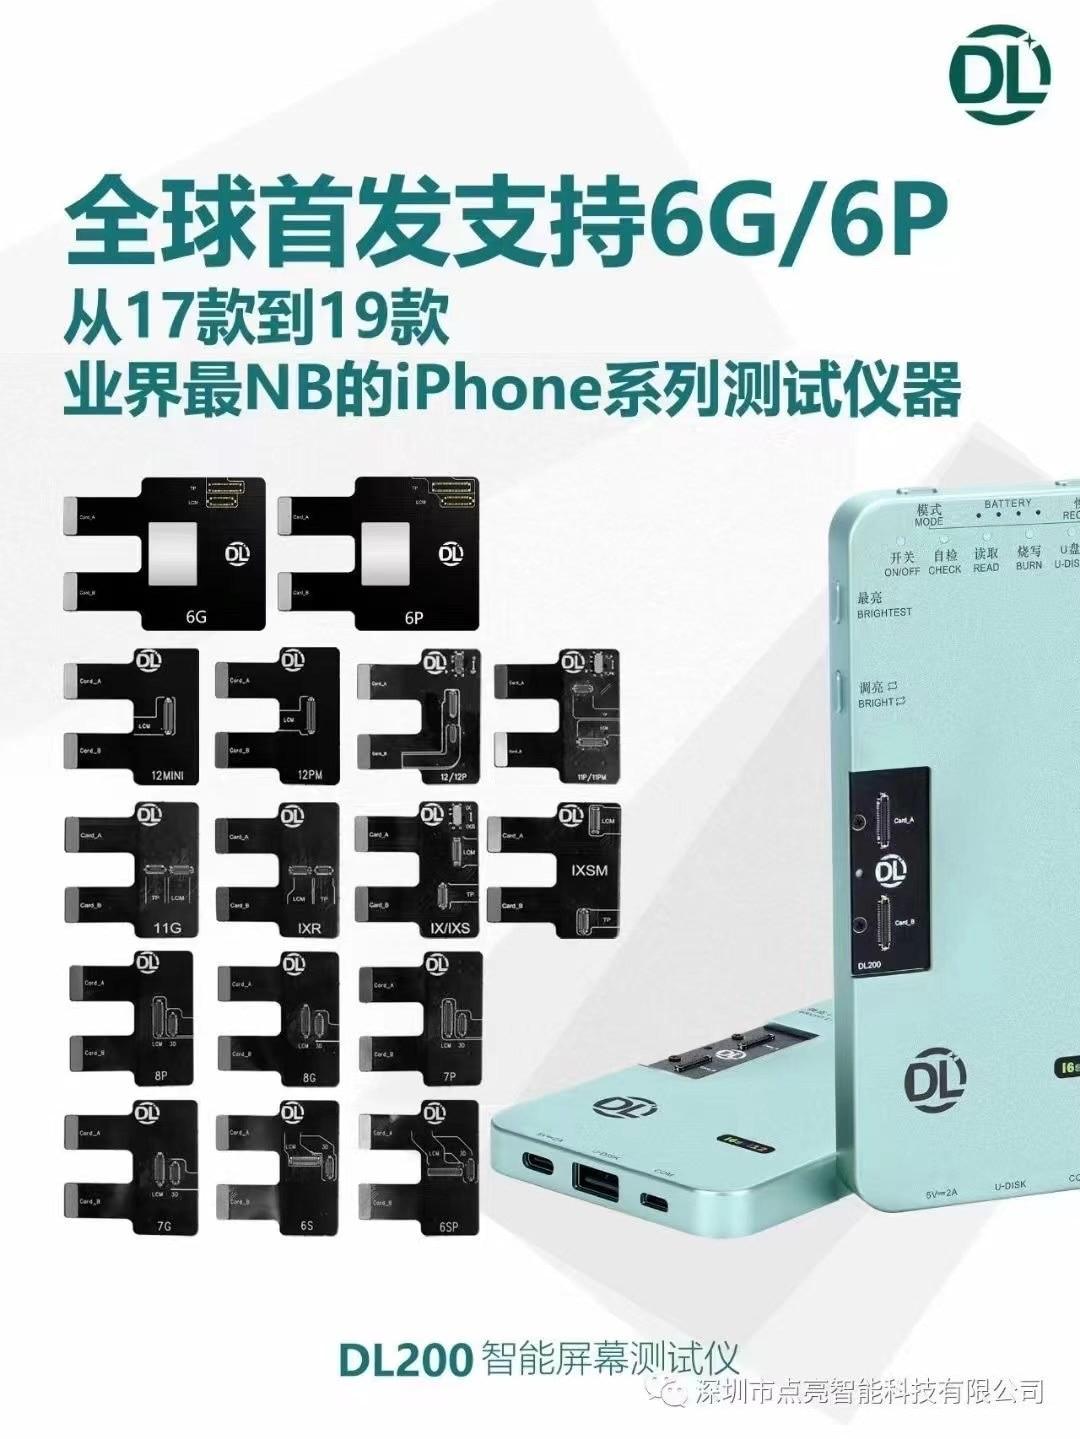 DL200 19 في 1 LCD عرض تستر آيفون 12mini 12 Pro ماكس 11 X Xs XR 6s 7 8 6 و Plus صحيح لهجة ضوء الاستشعار اختبار إصلاح